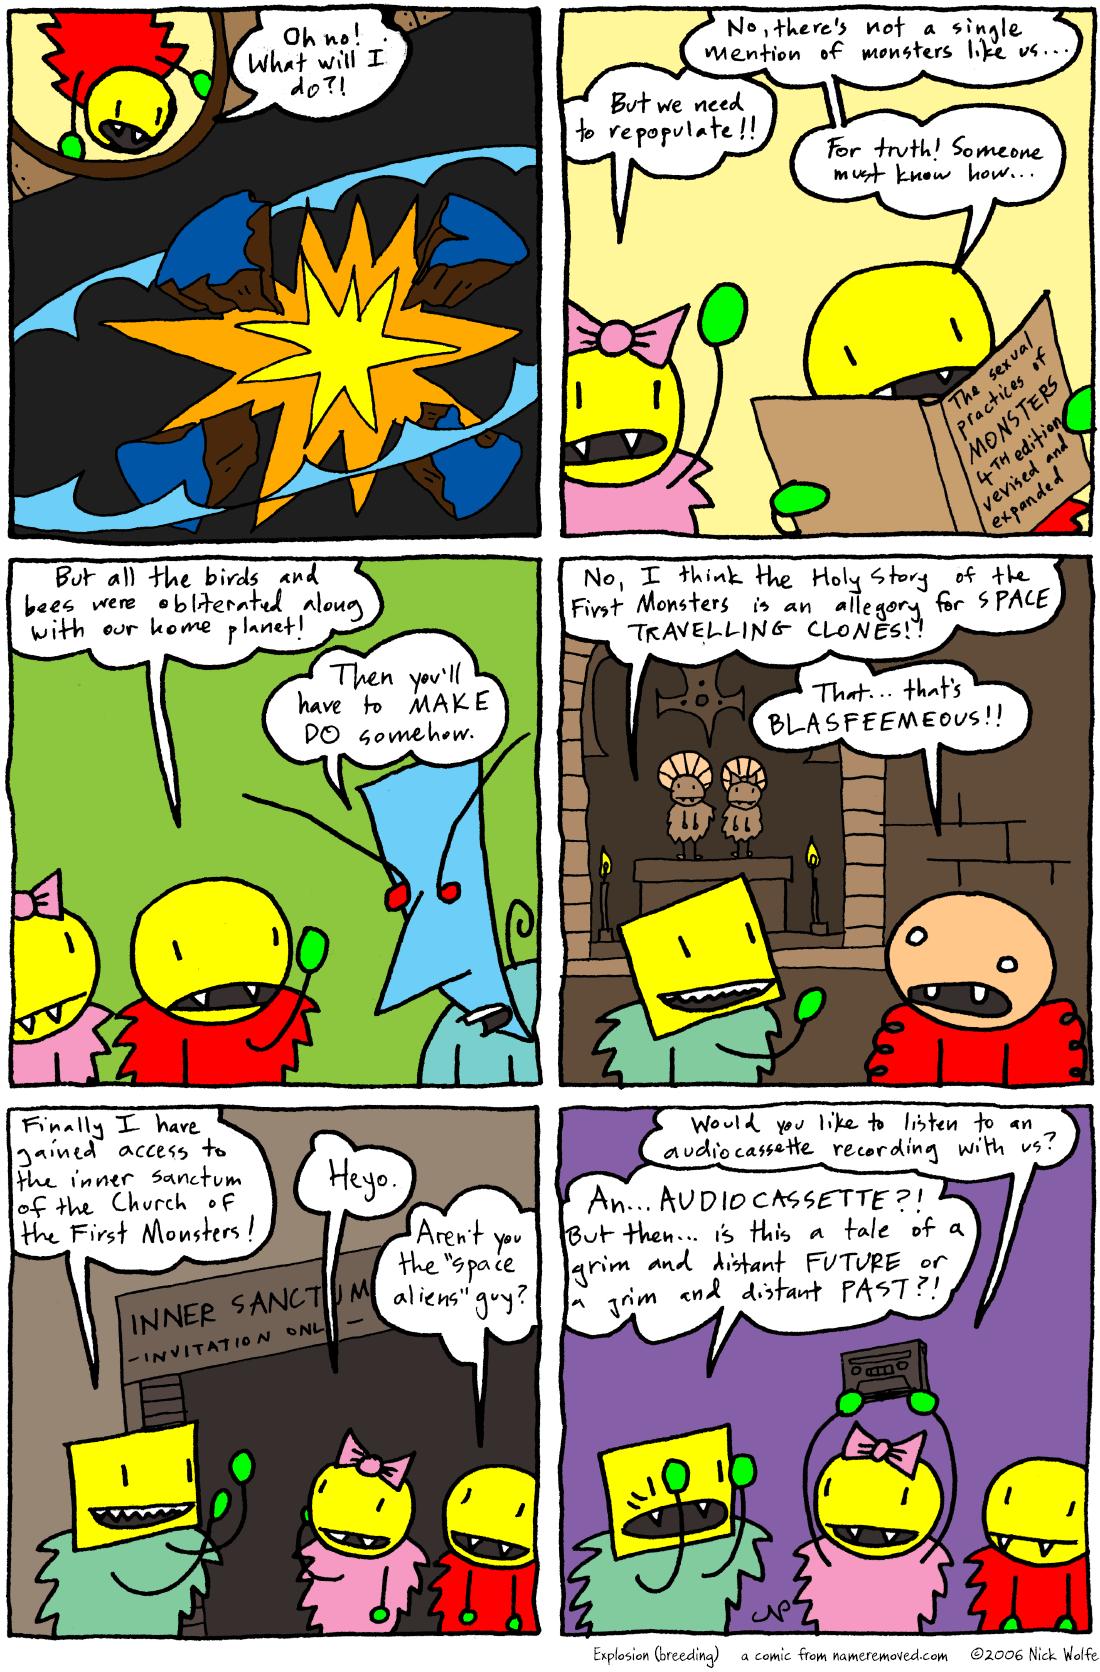 Explosion (breeding)